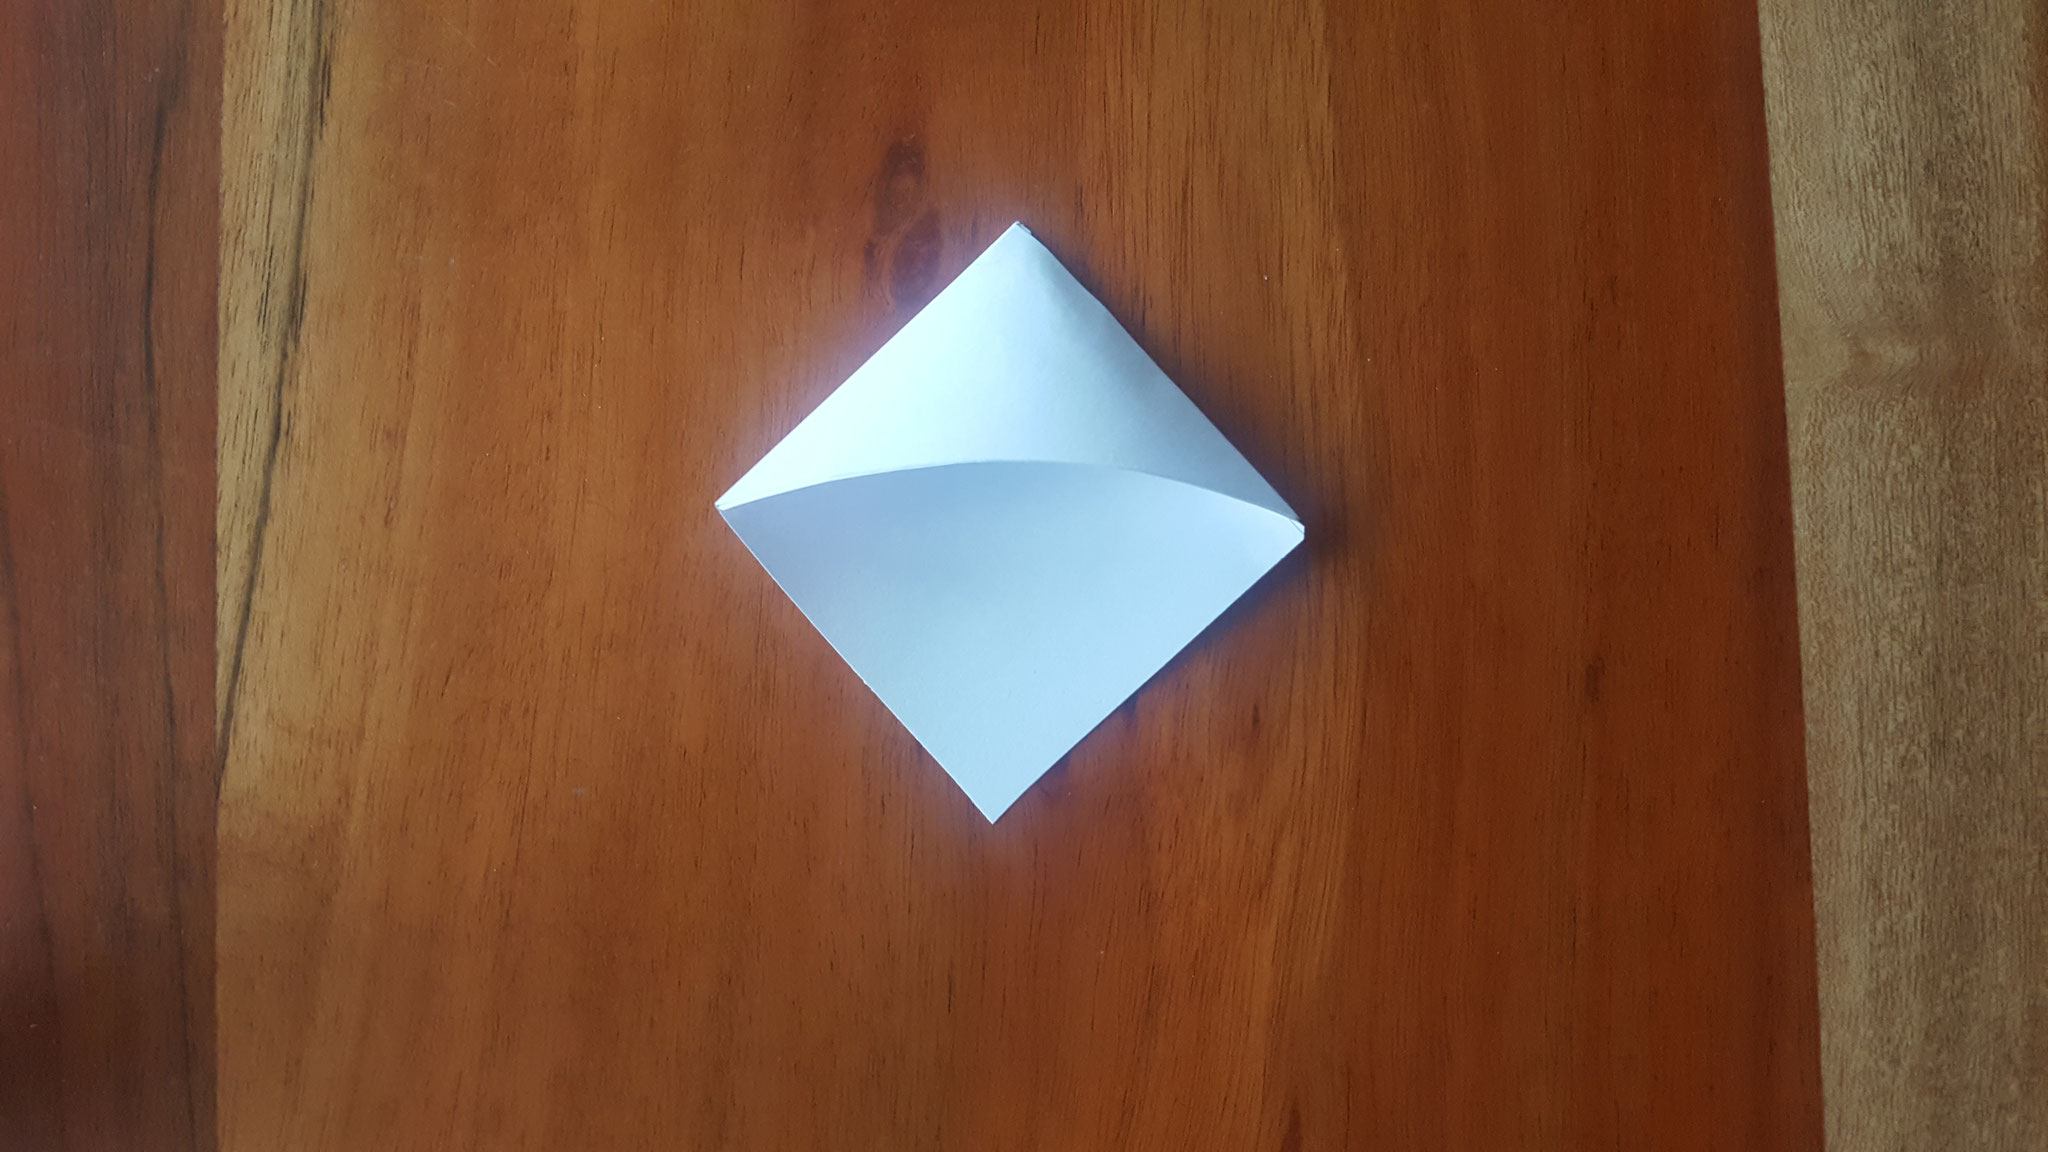 Das obere Dreieck an das Untere geklebt